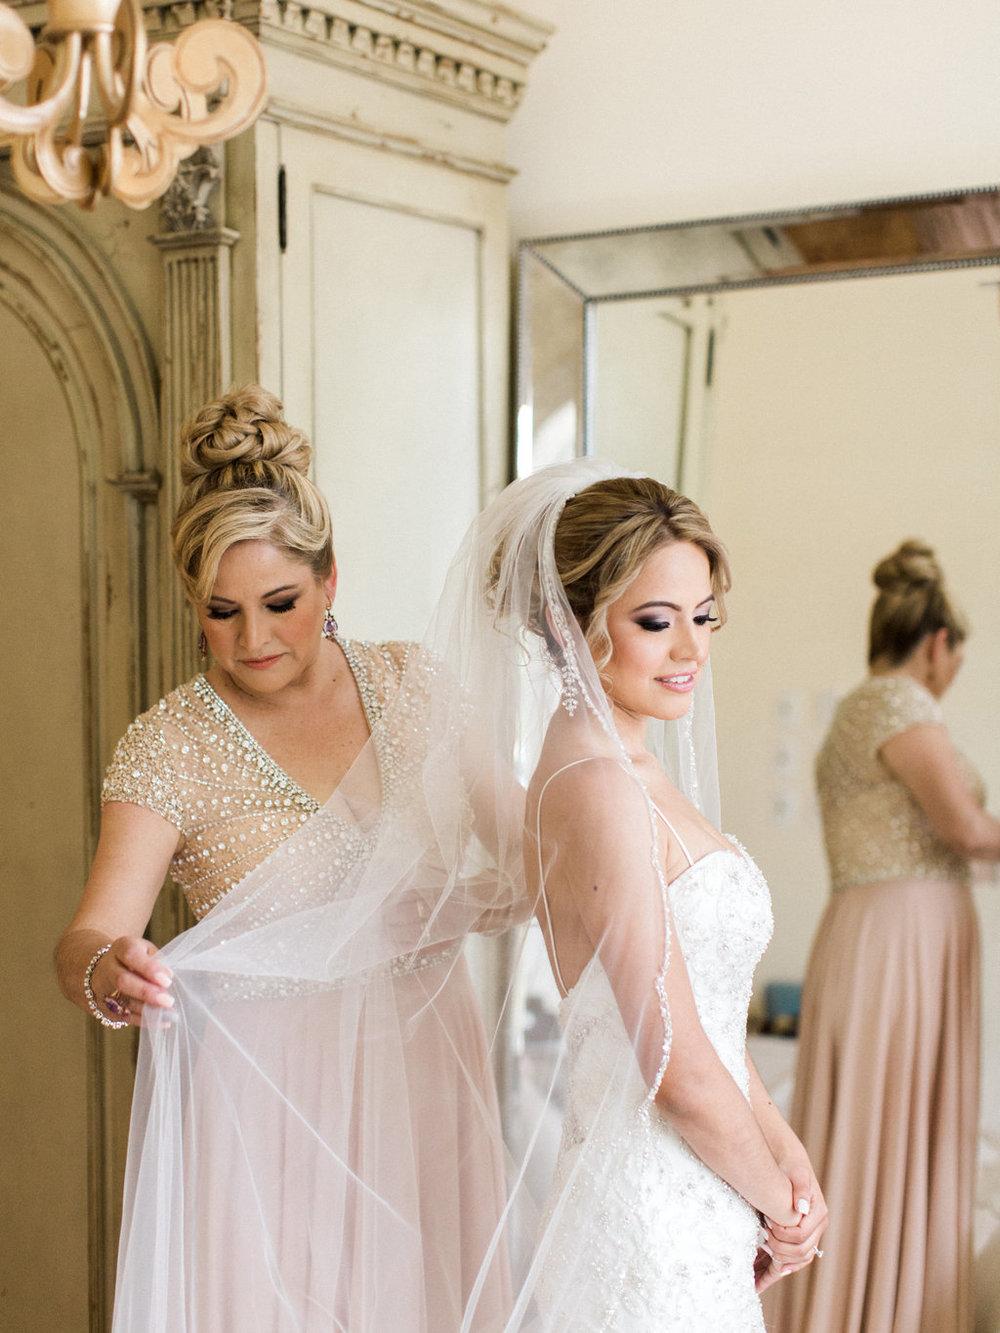 Morais-Vineyards-Winery-Beatleton-Virginia-Wedding-Photographer-13.jpg